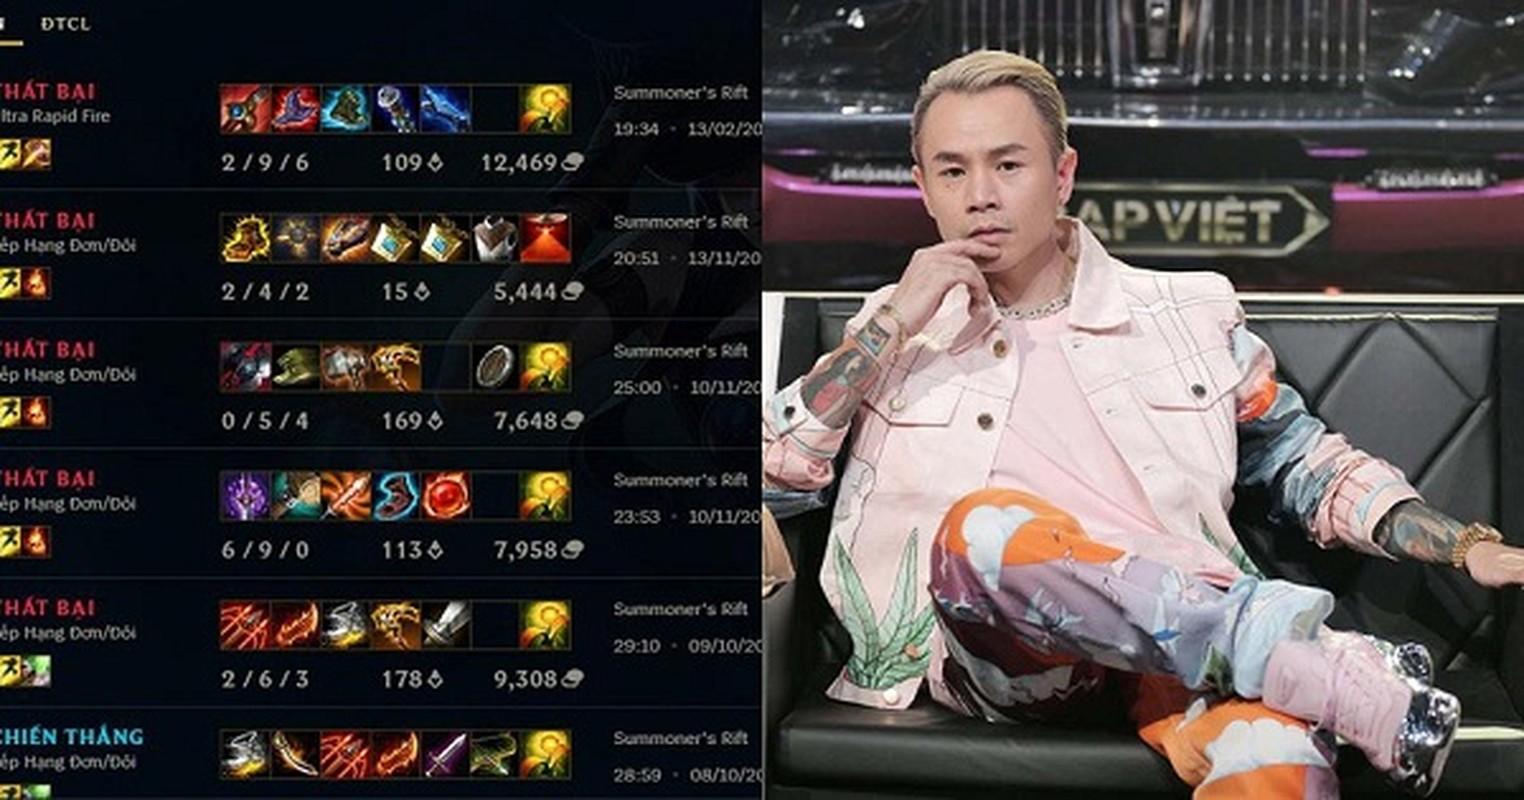 Hoa ra Binz, Son Tung M-TP va Den Vau cung la fan cuong LMHT